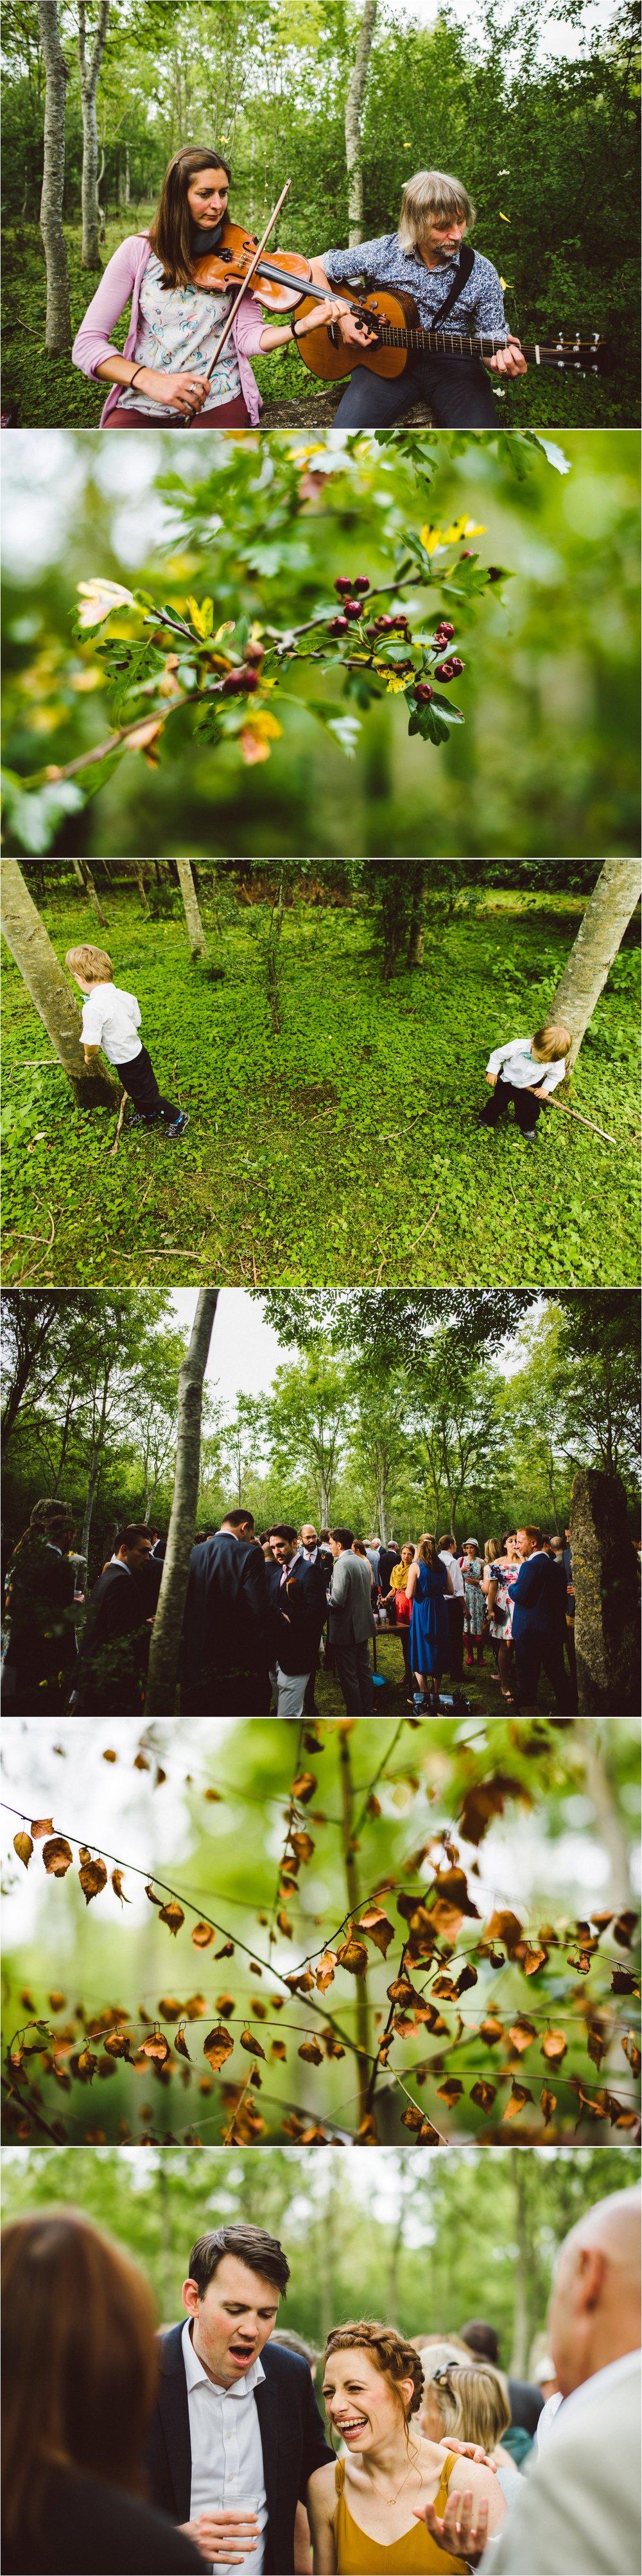 Gloucestershire outdoor wedding photographer_0120.jpg